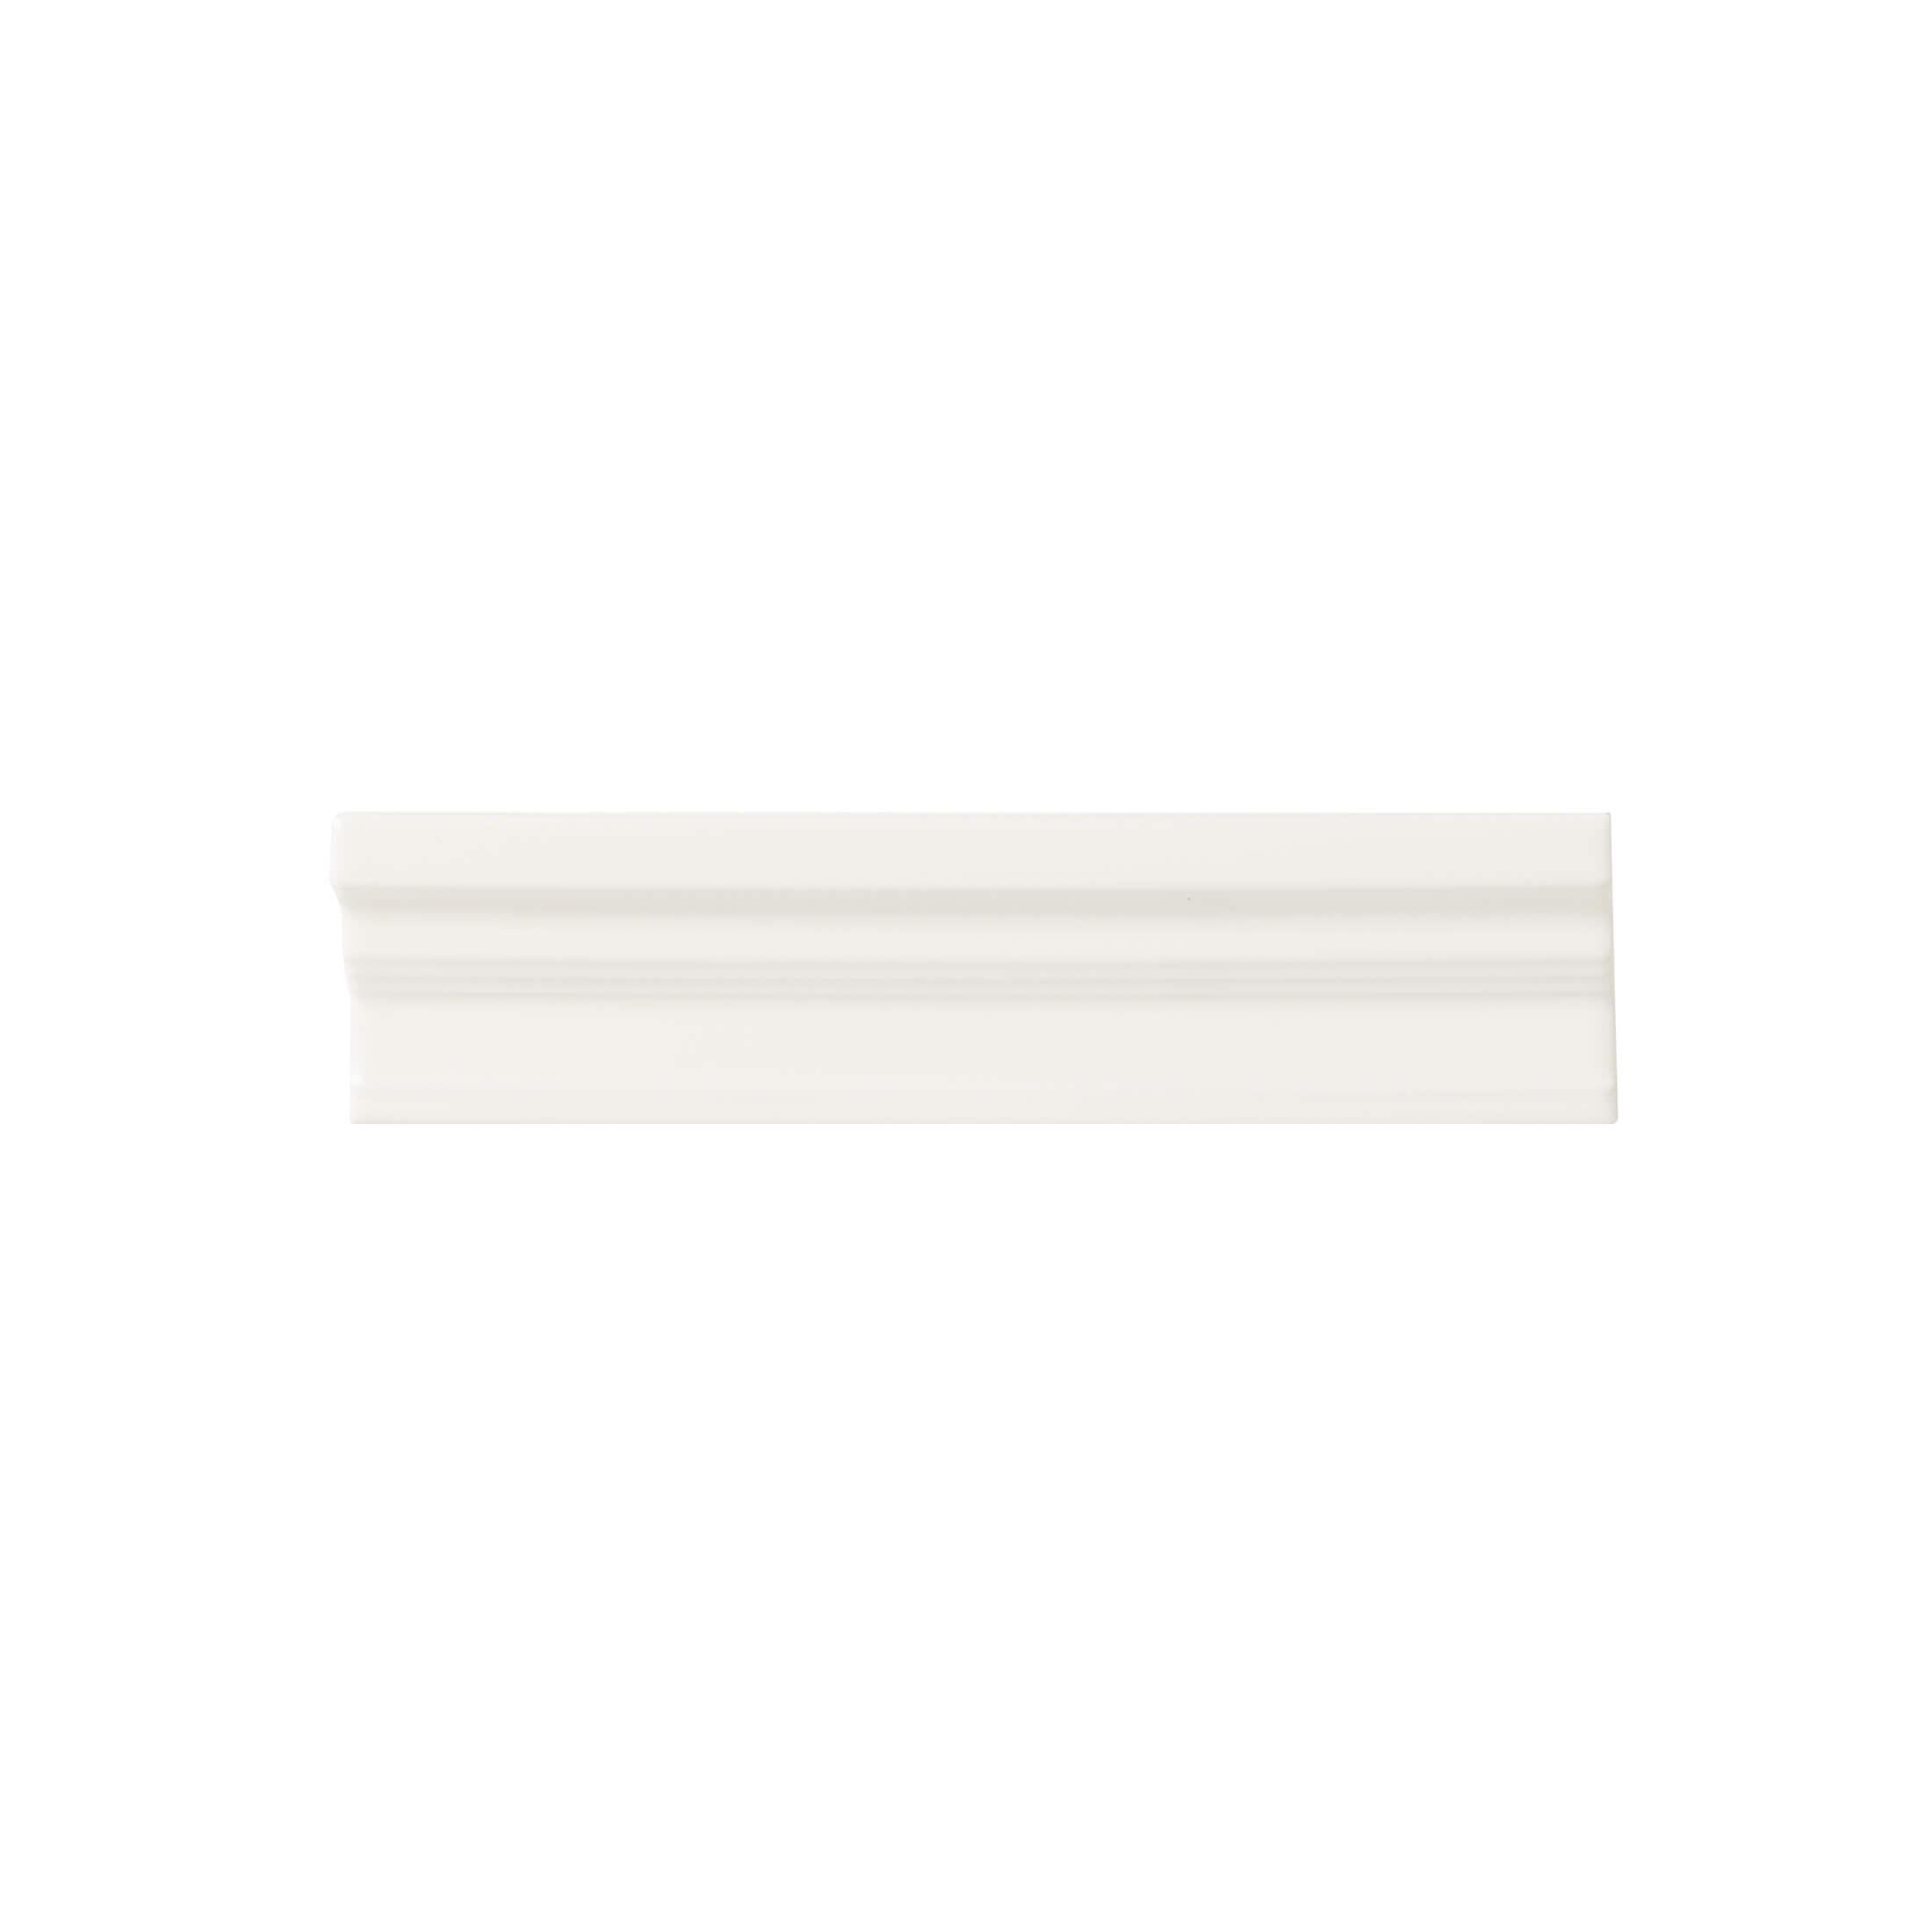 ADNE5465 - CORNISA CLASICA - 5 cm X 20 cm